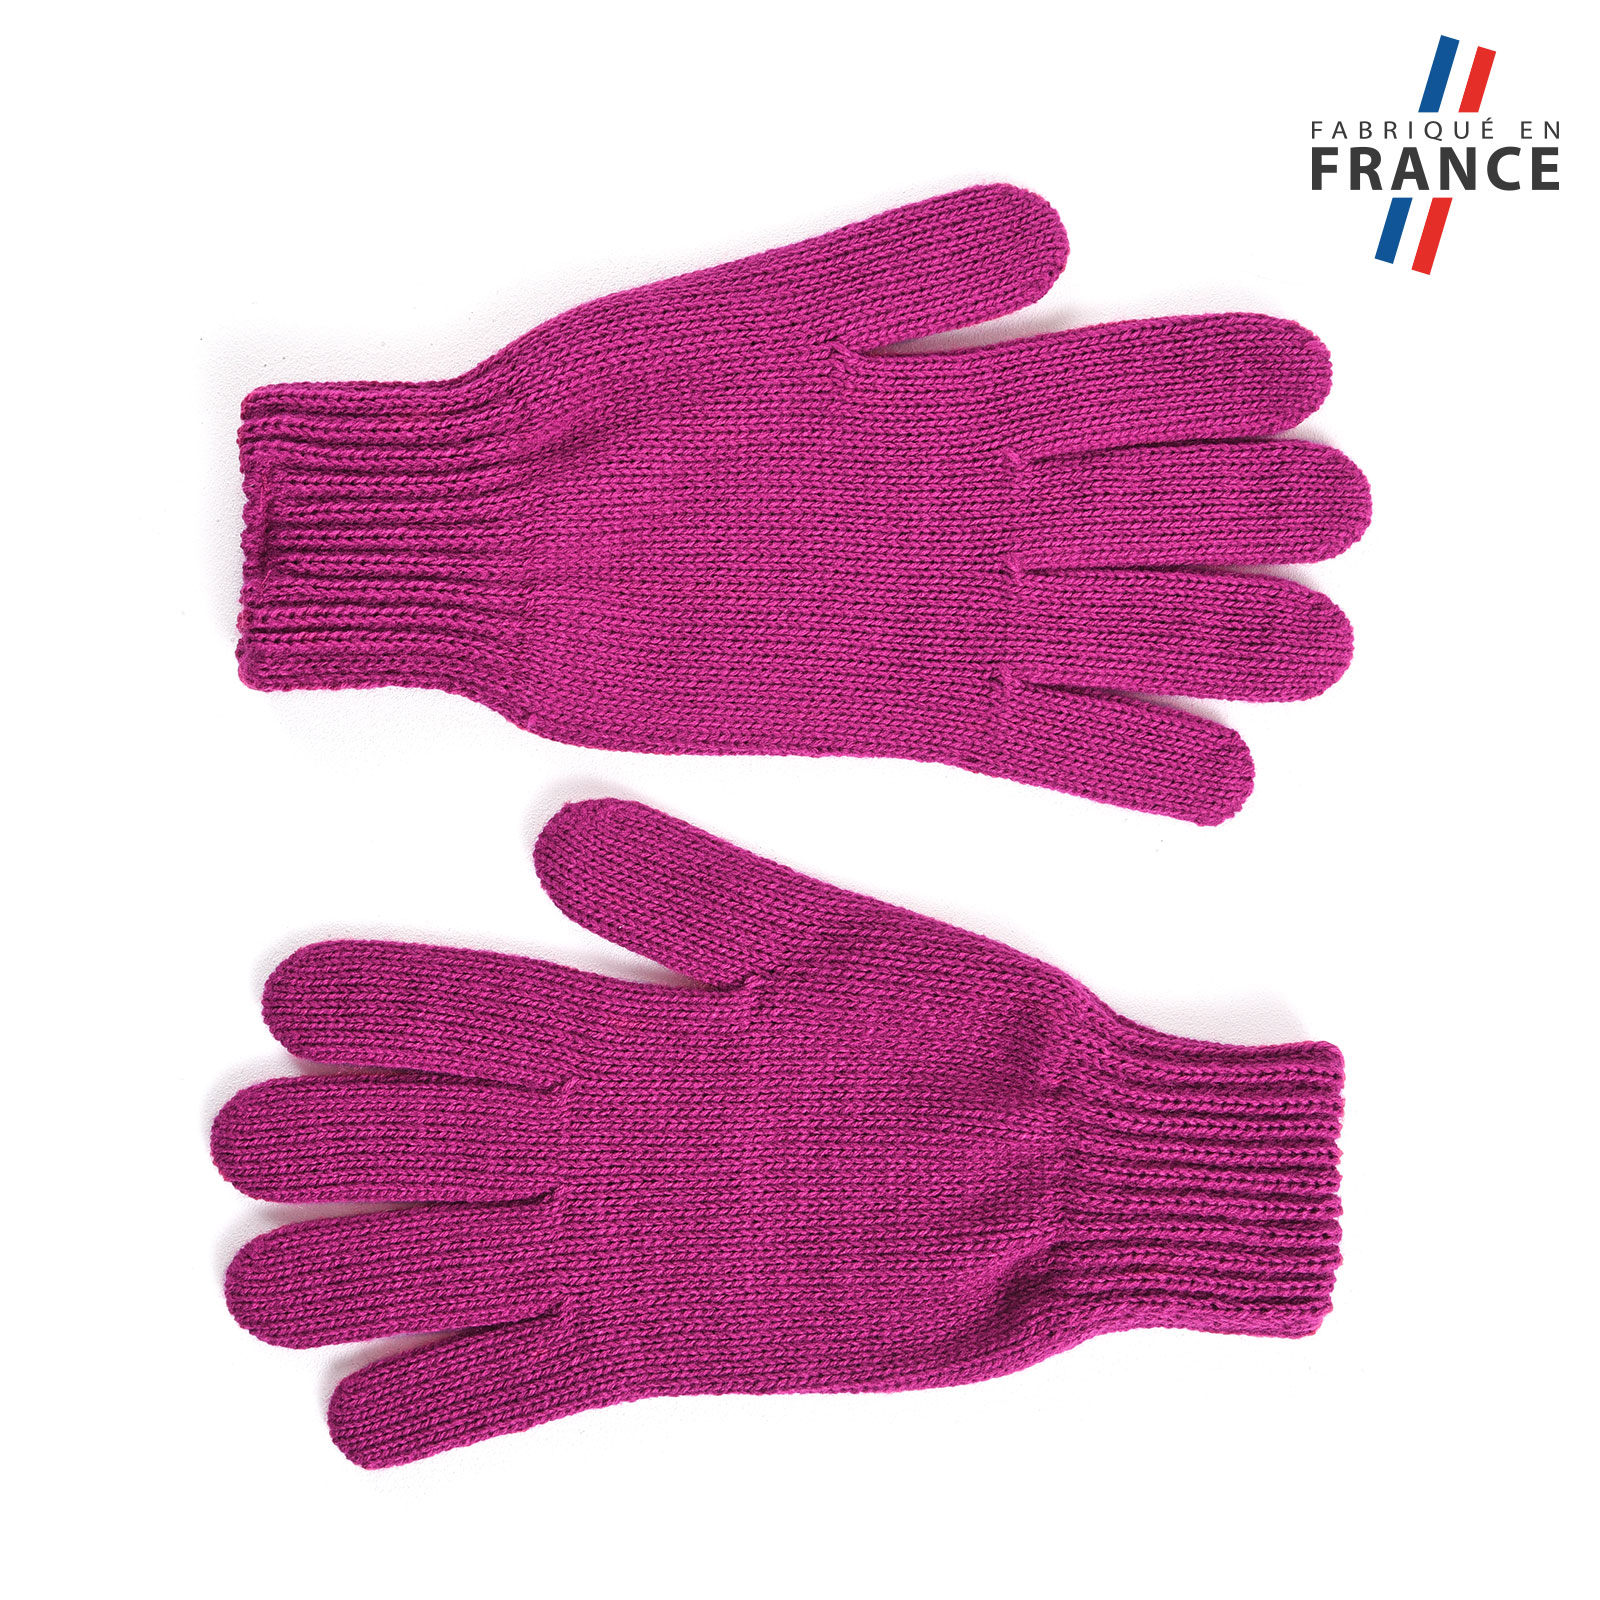 GA-00010-A16-LB_FR-gants-rose-fuchsia